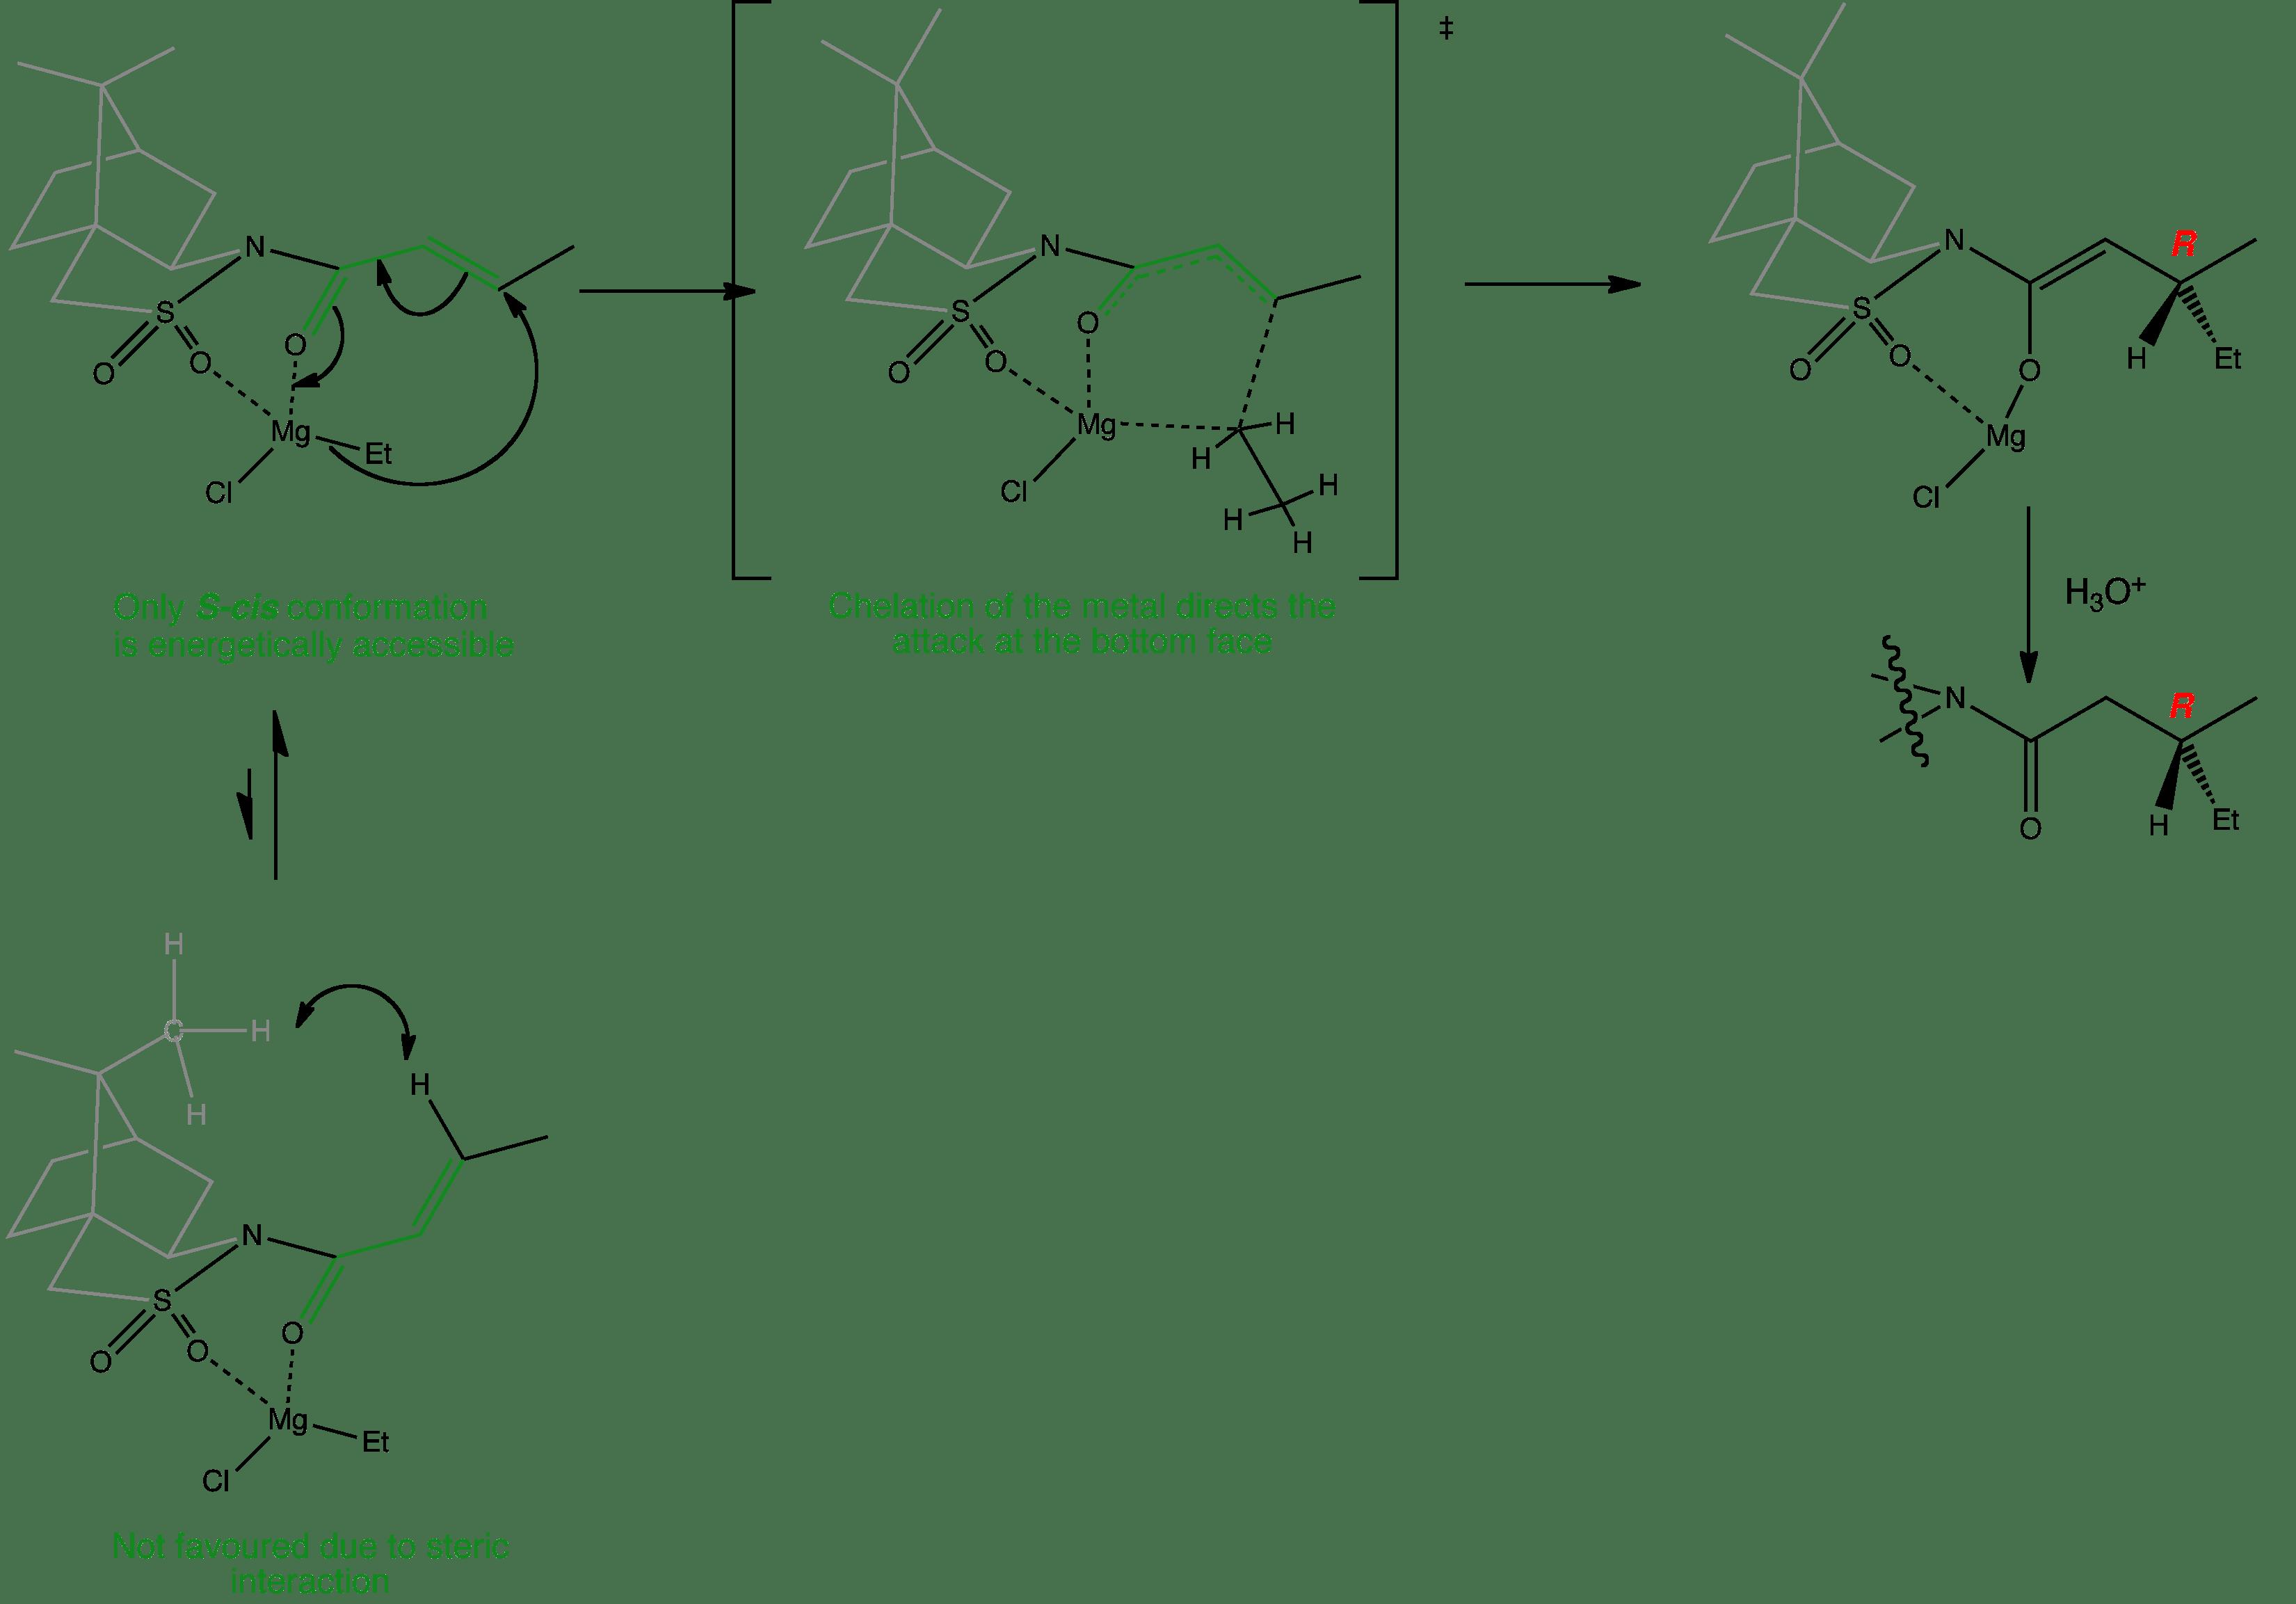 Enantioselective Conjugate Addition - Oppolzer's sultam